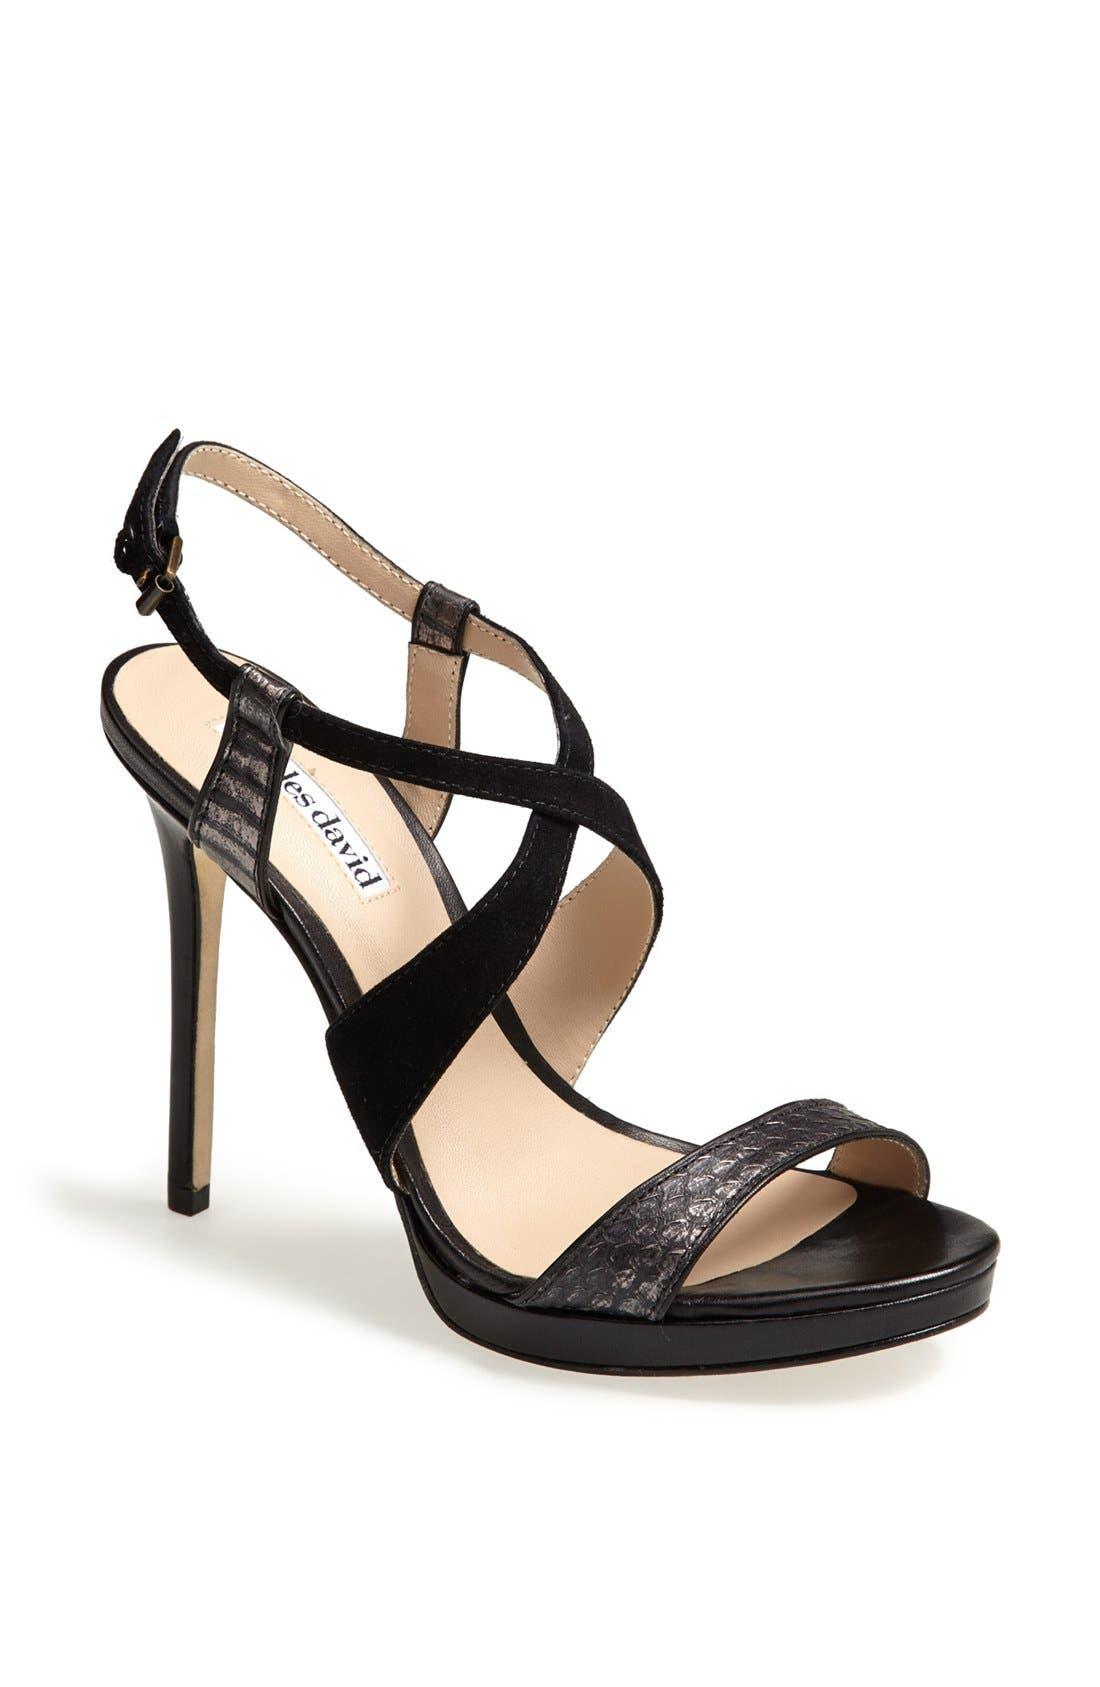 Alternate Image 1 Selected - Charles David 'Hermosa' Platform Sandal